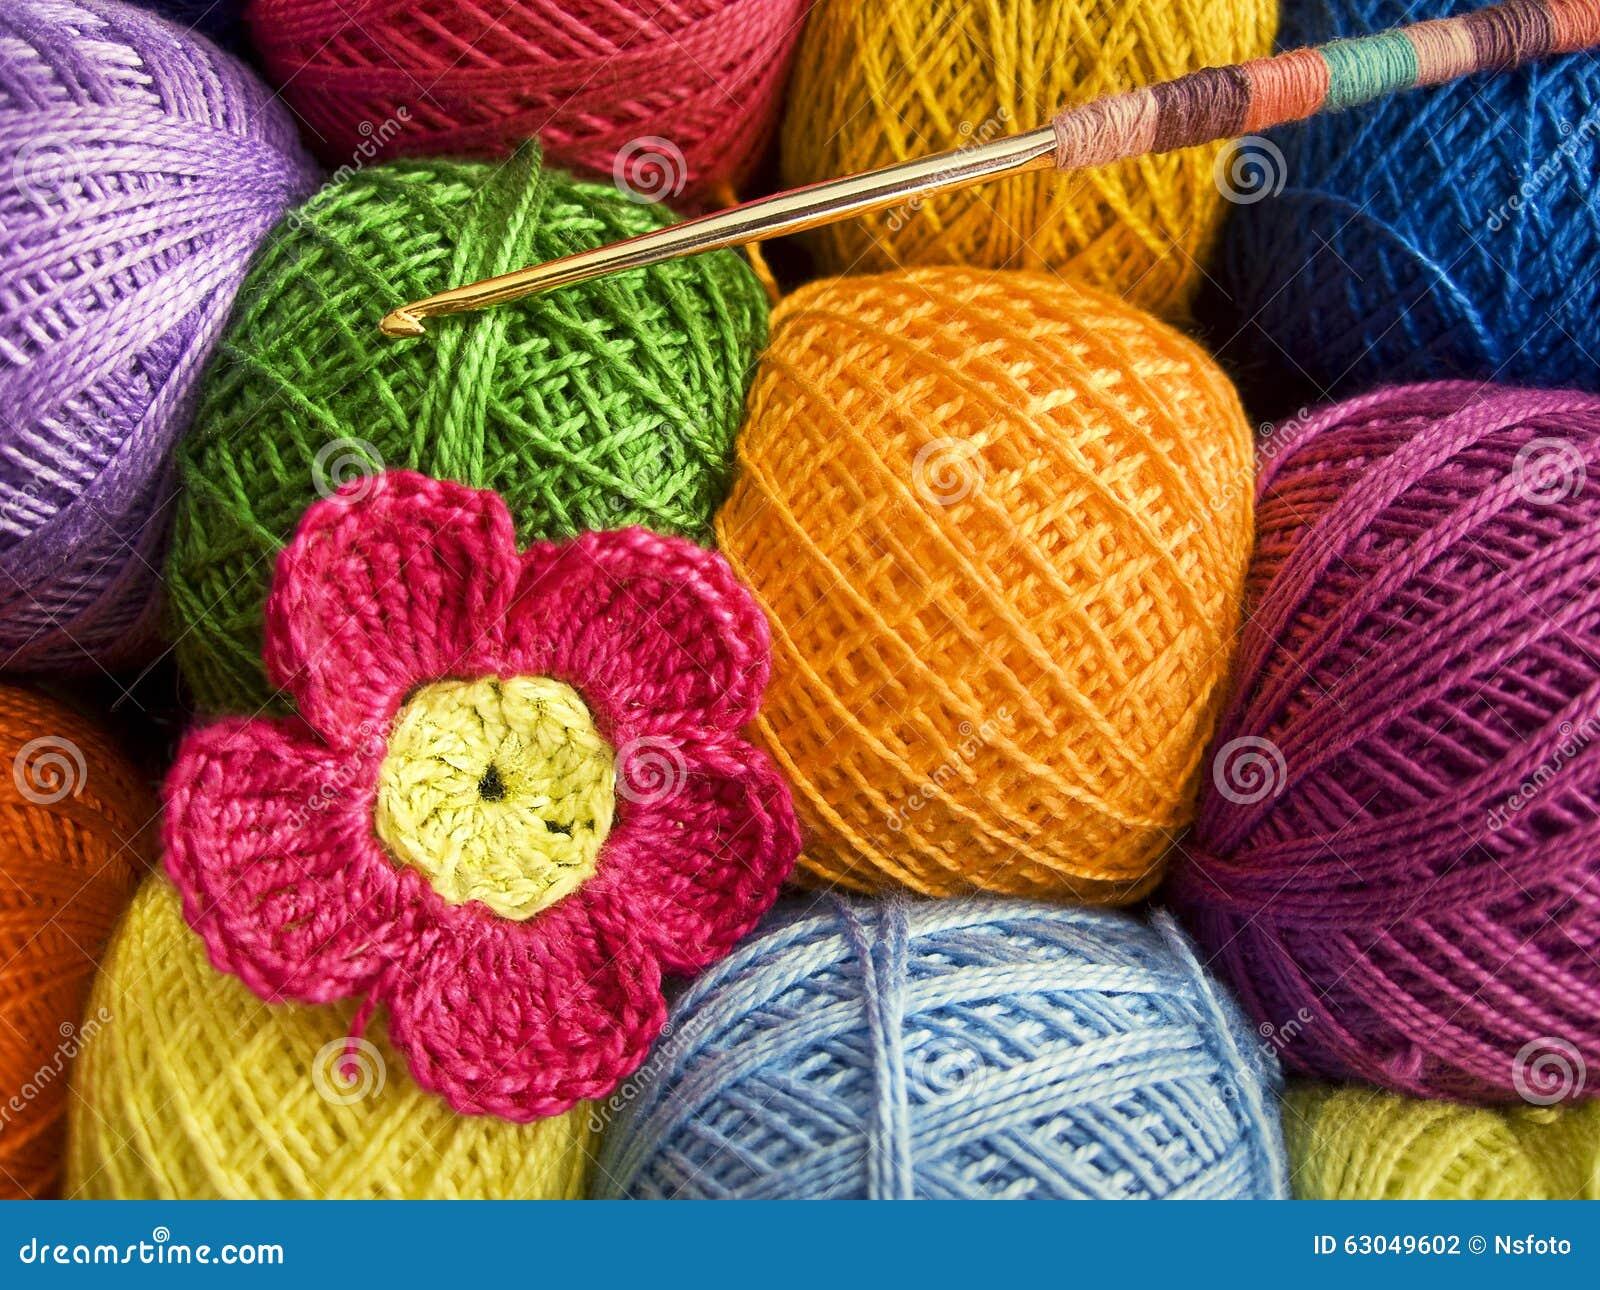 ball of yarn crochet - photo #41